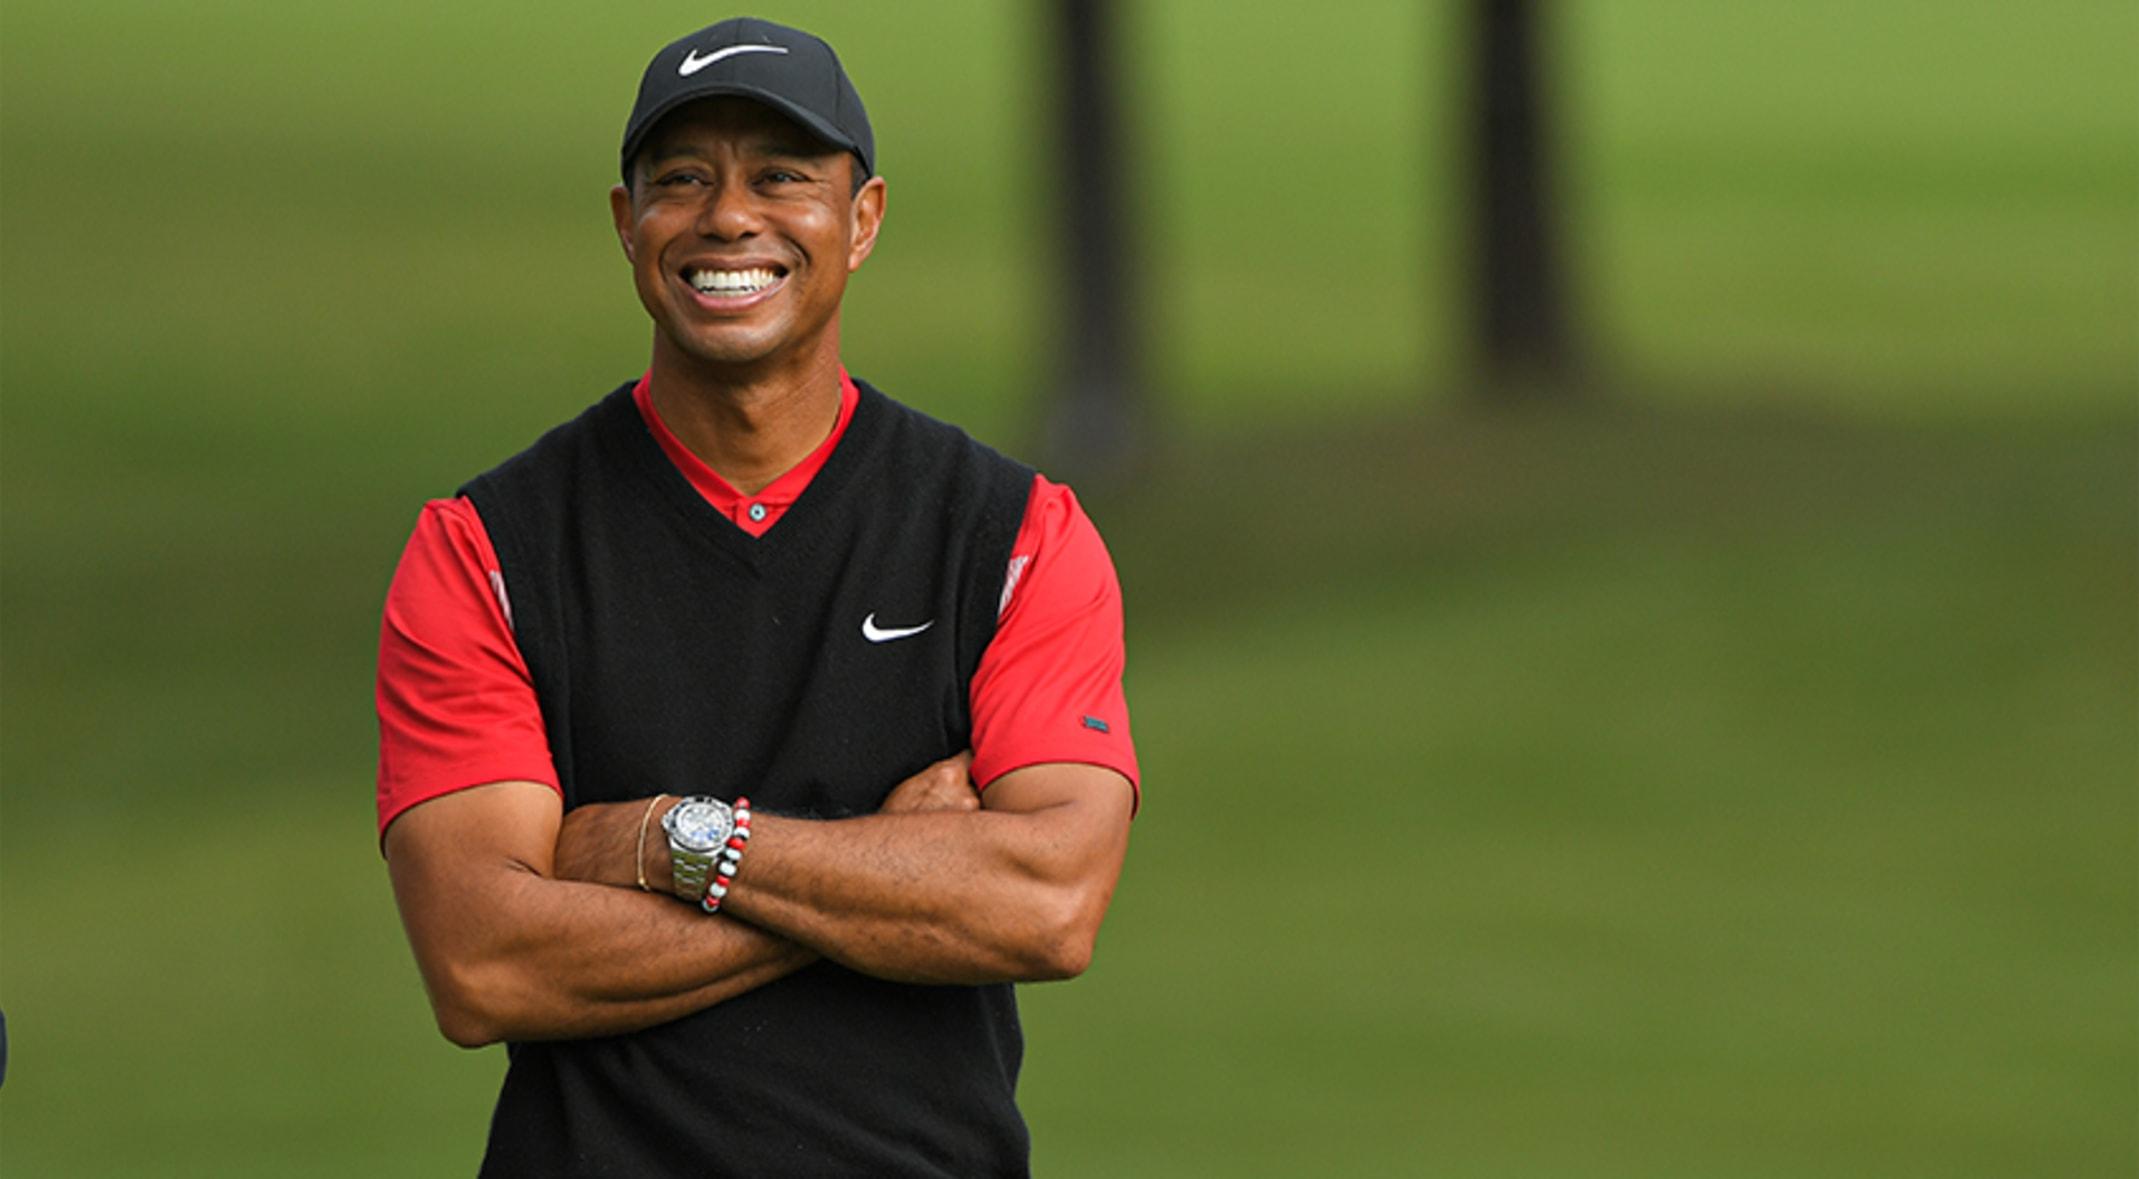 Tiger Woods ile ilgili görsel sonucu